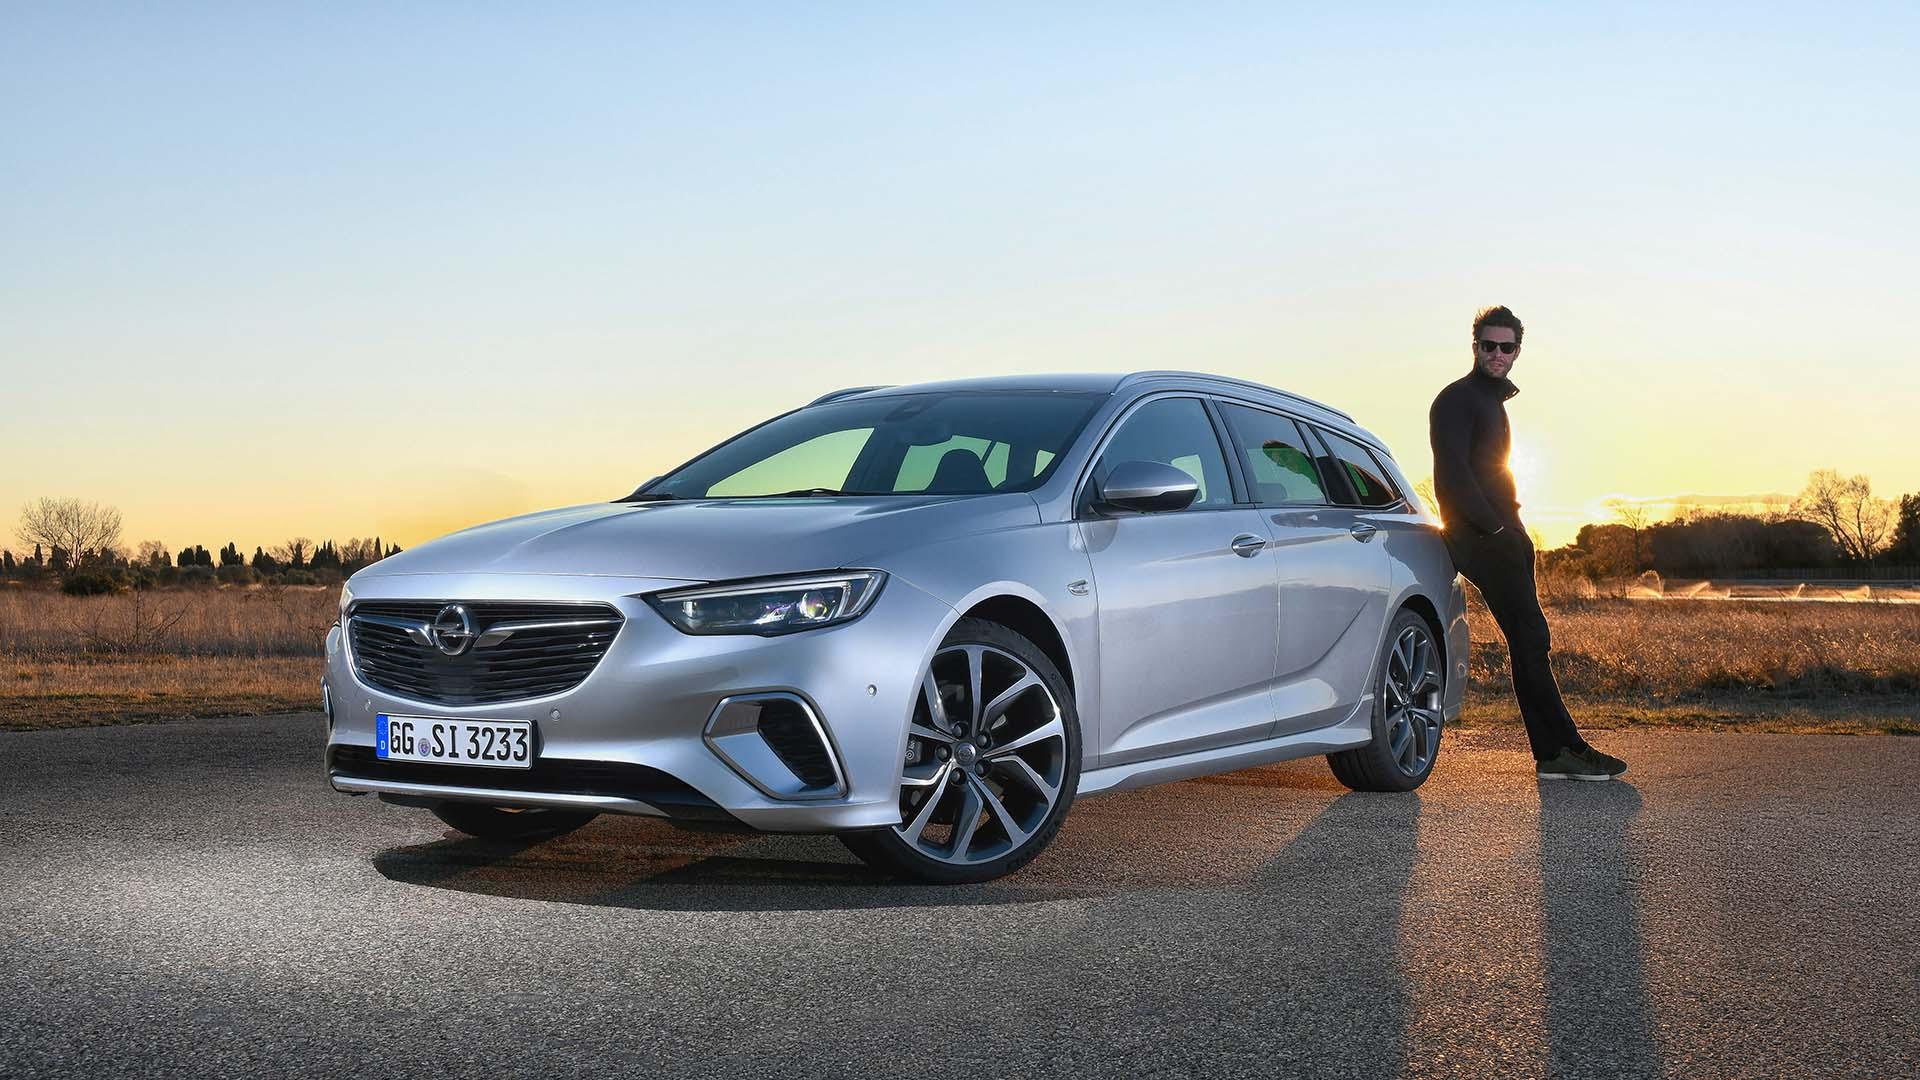 https://www.autosvilag.com/images/markak/Opel/Insignia_GSi/Opel-Insignia-GSi-Sports-Tourer-7.jpg